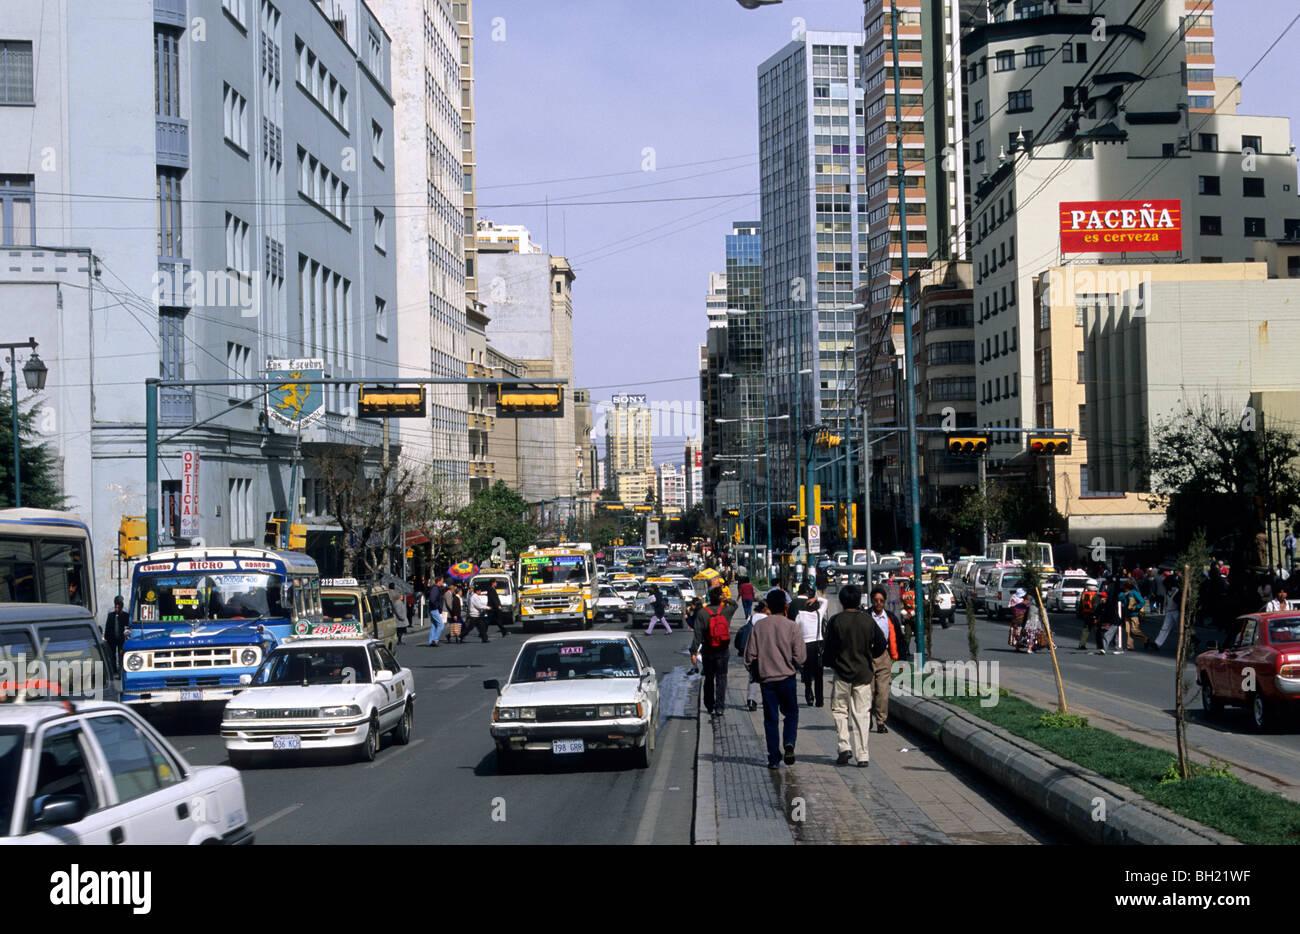 Mariscal Street Santa Cruz La Paz Bolivia Stock Photo Alamy